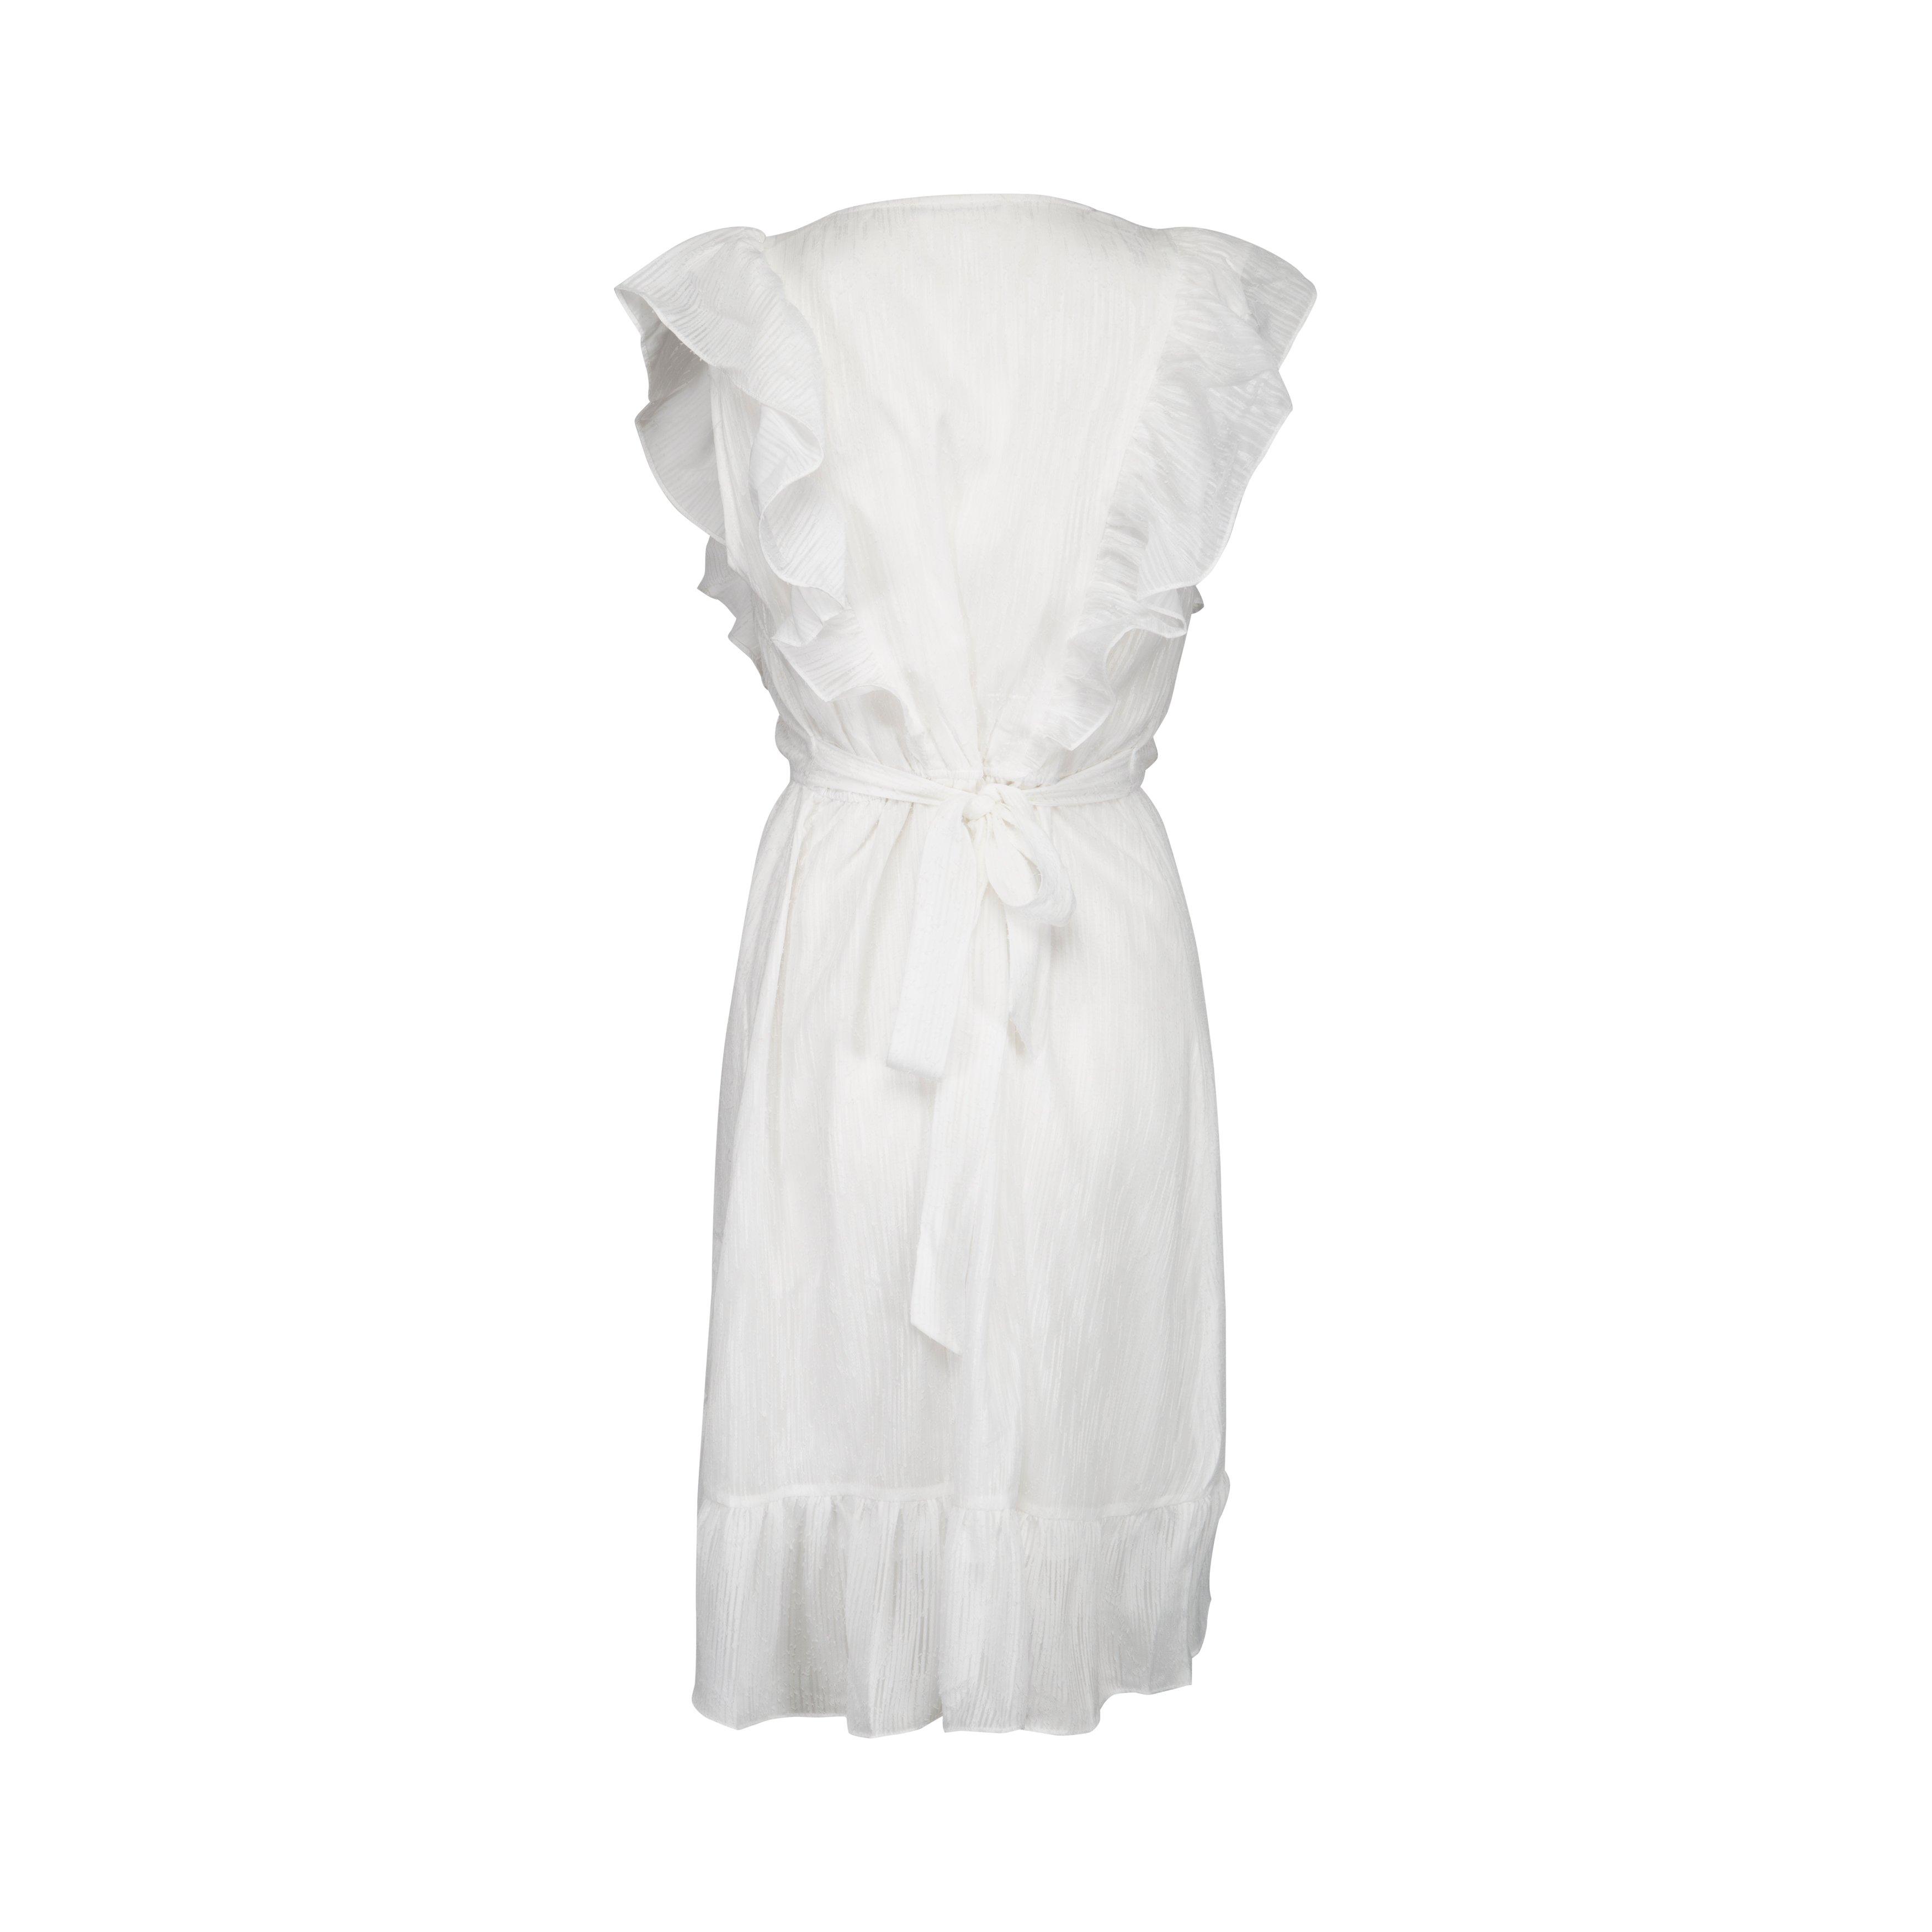 Sofie Schnoor vit klänning